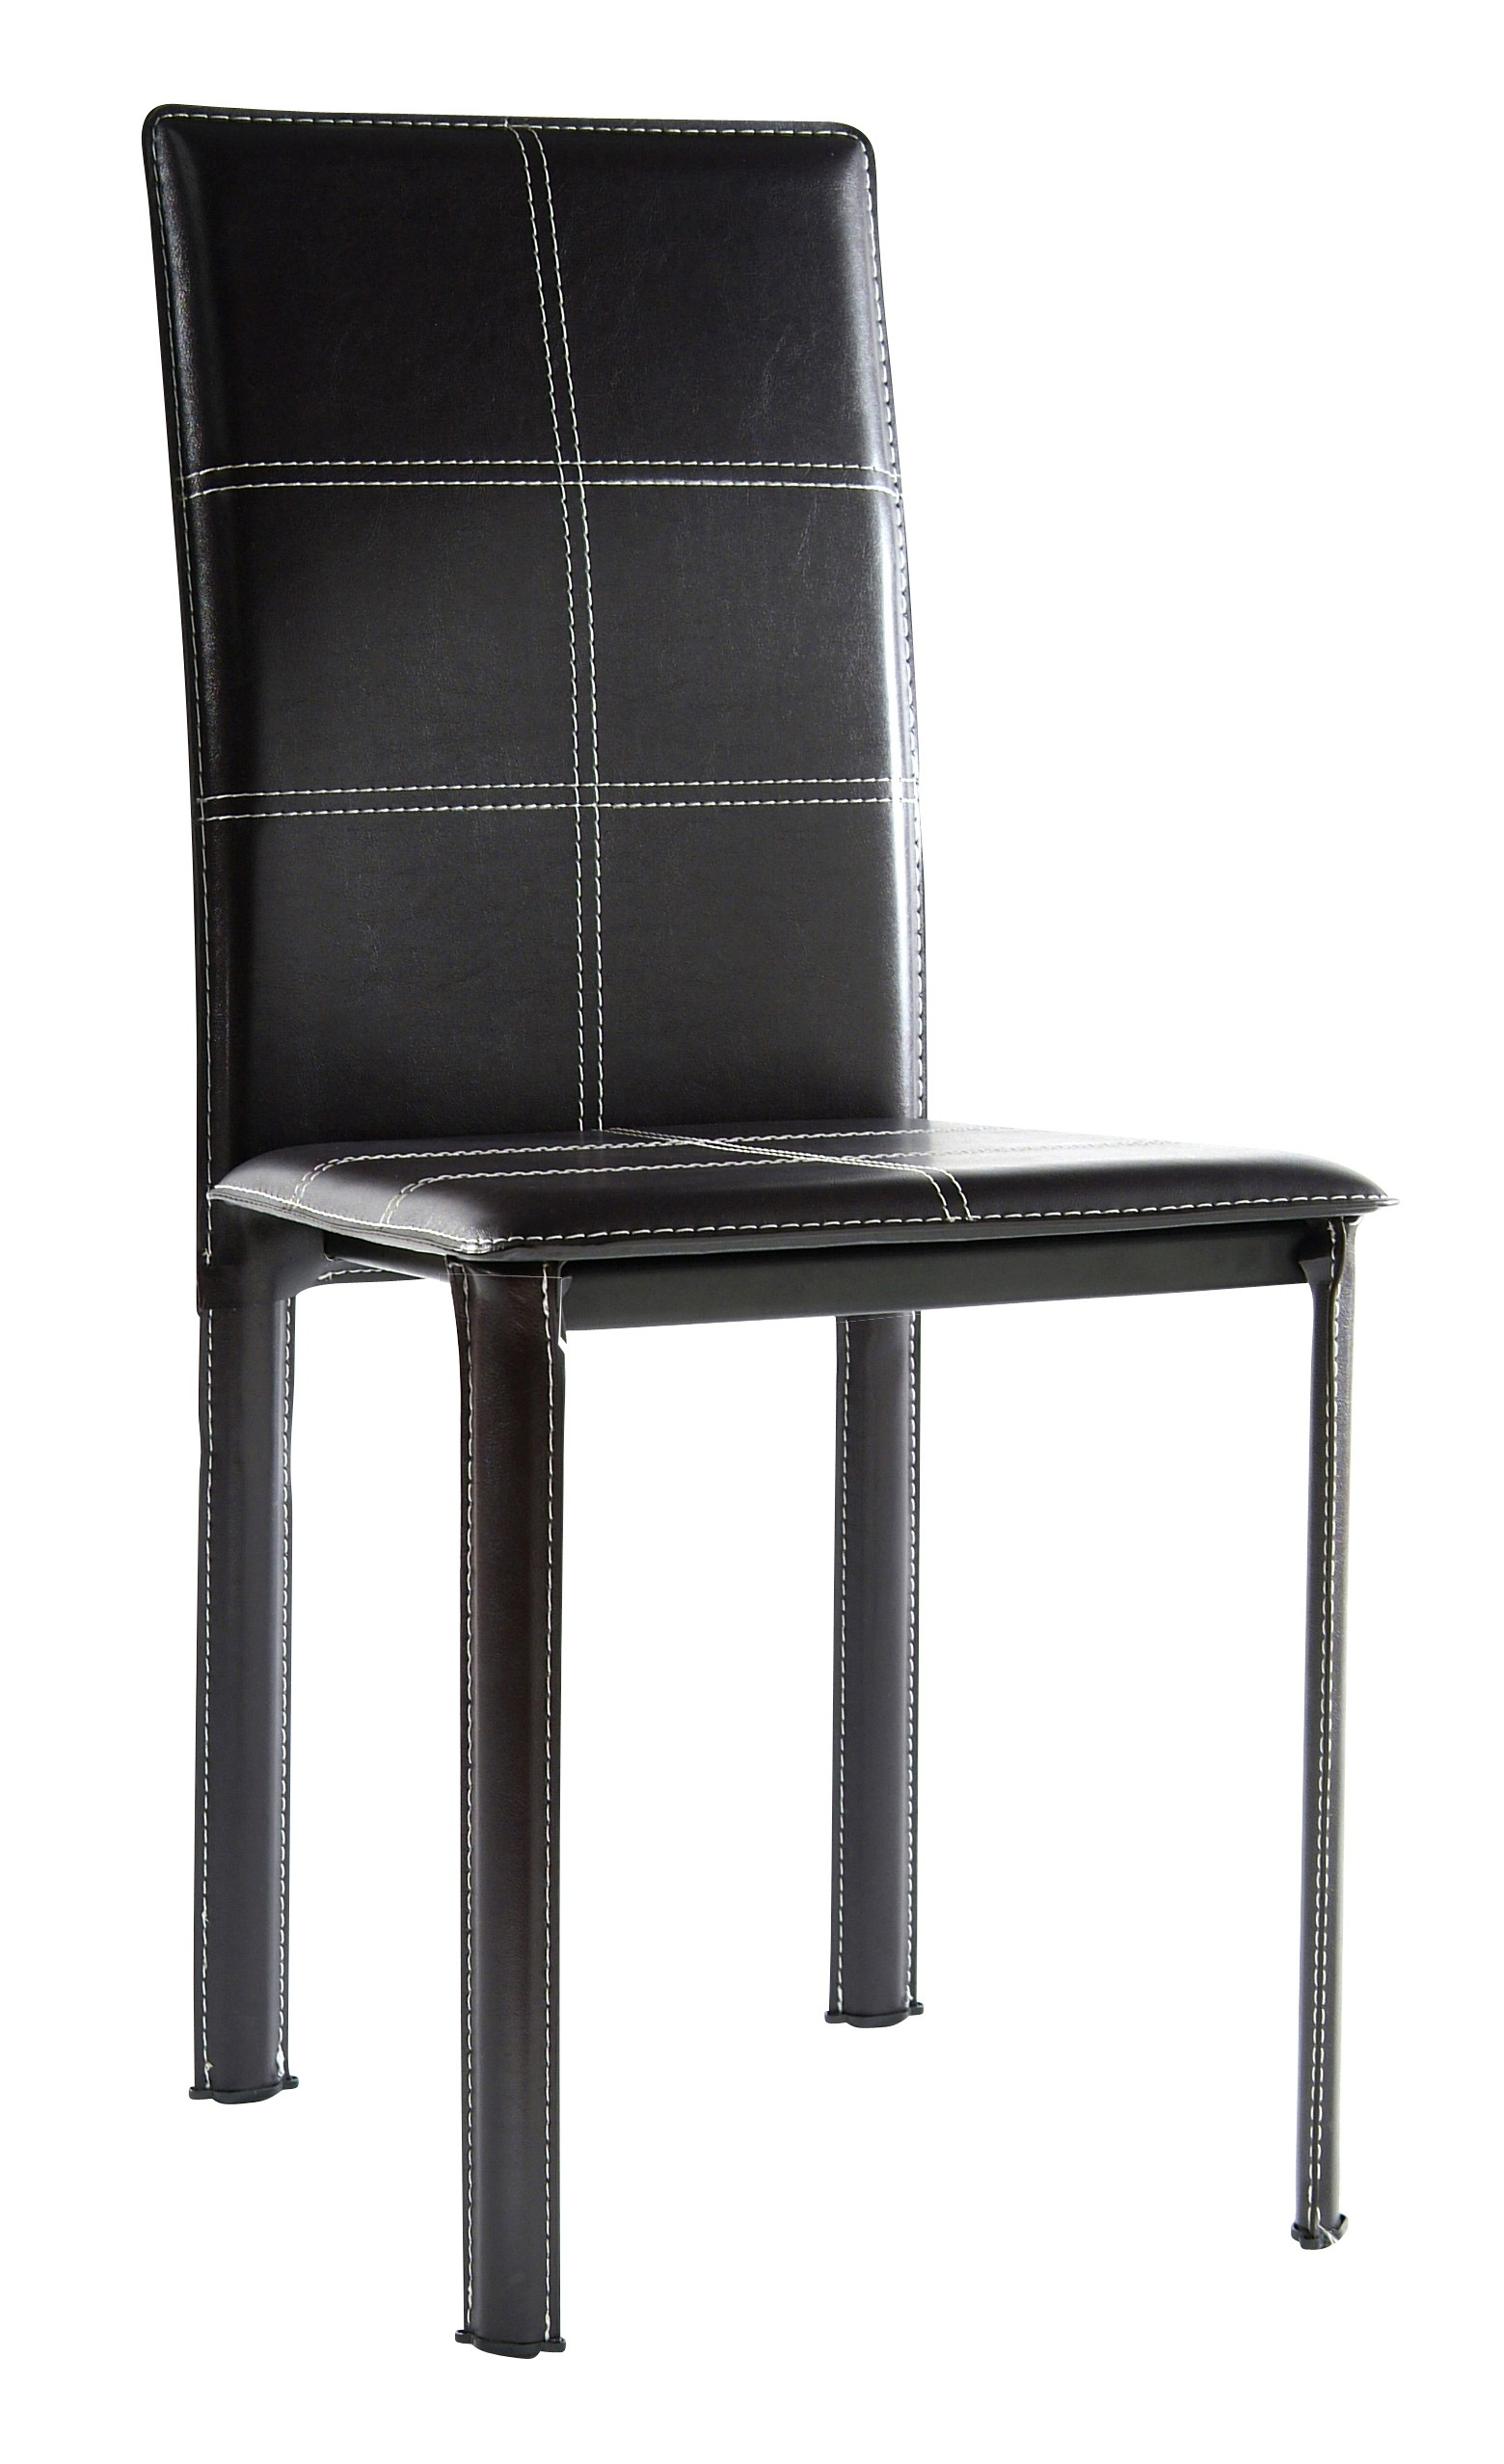 chaise pvc marron games. Black Bedroom Furniture Sets. Home Design Ideas